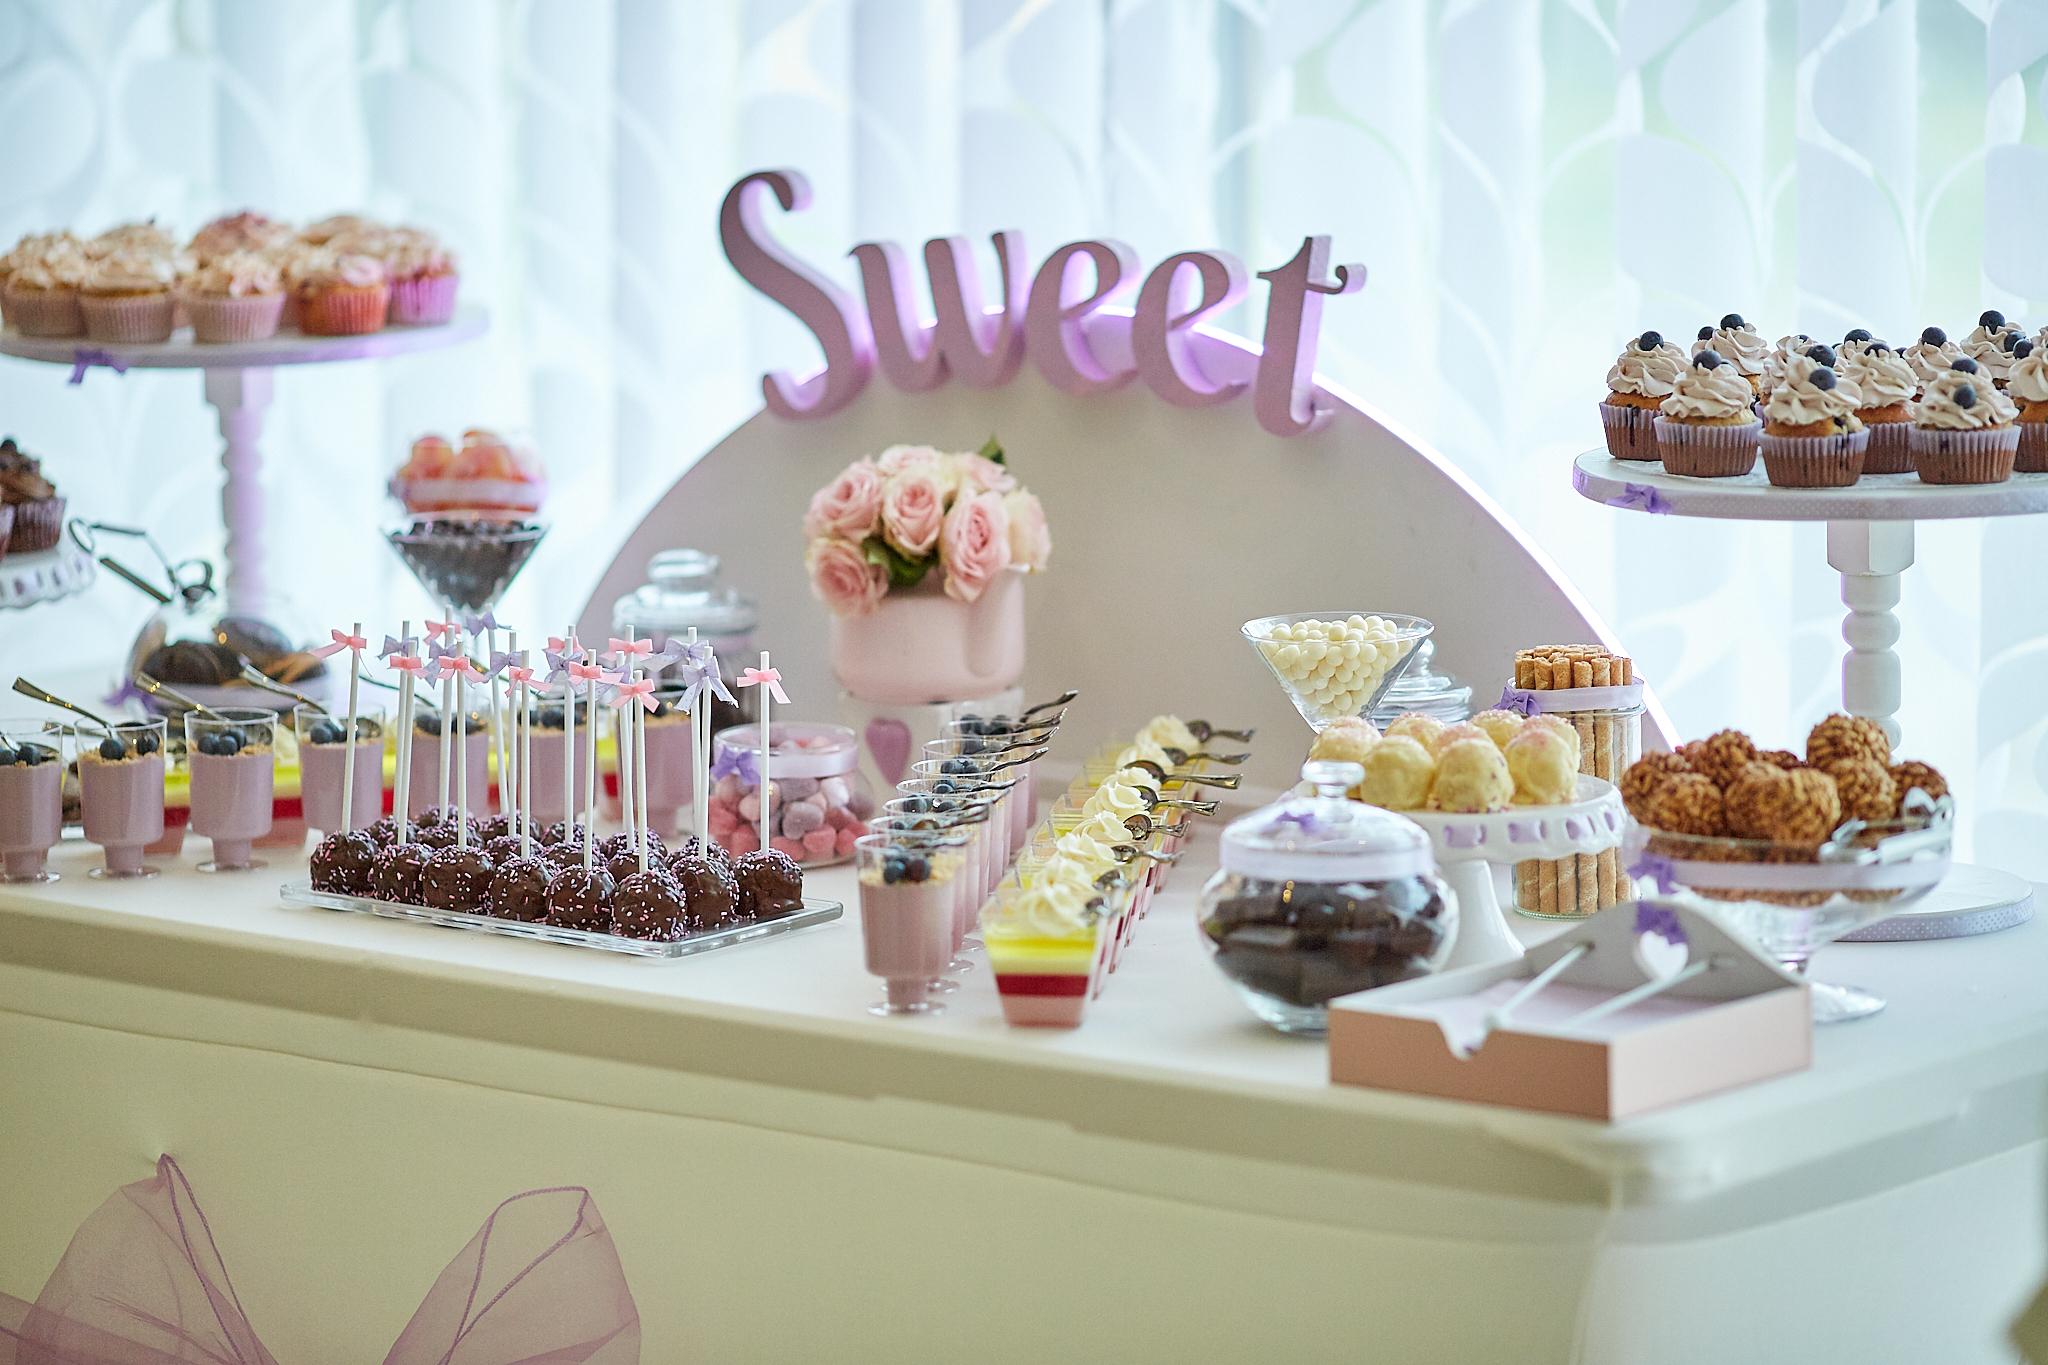 Candy Bar Slodki stol wesele siedlce milosc jest slodka babeczki atrakcja weselna 24